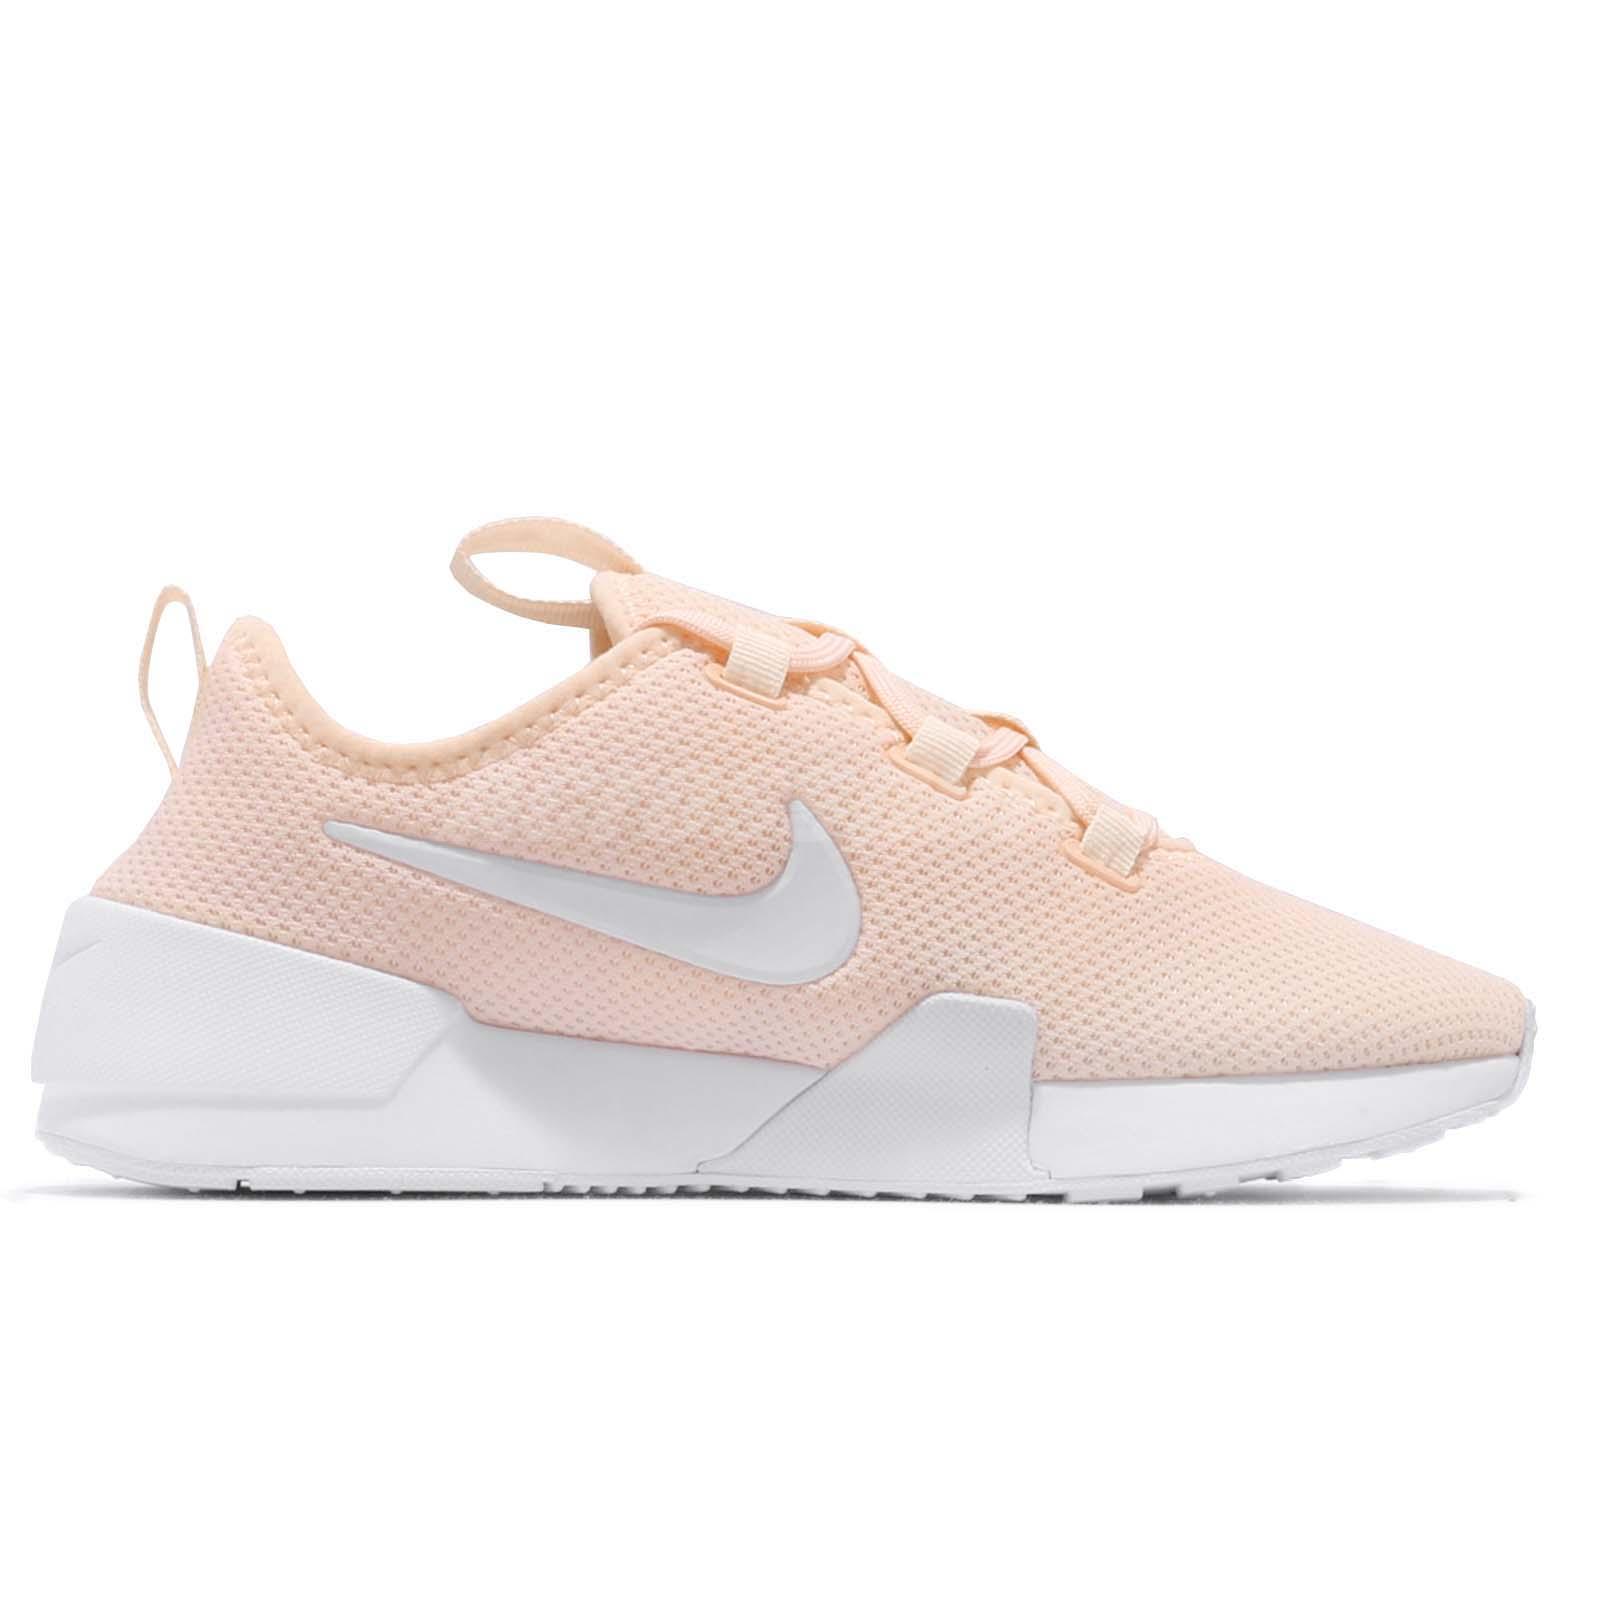 8a4373117d511 Nike Wmns Ashin Modern Guava Ice White Women Running Casual Shoes ...